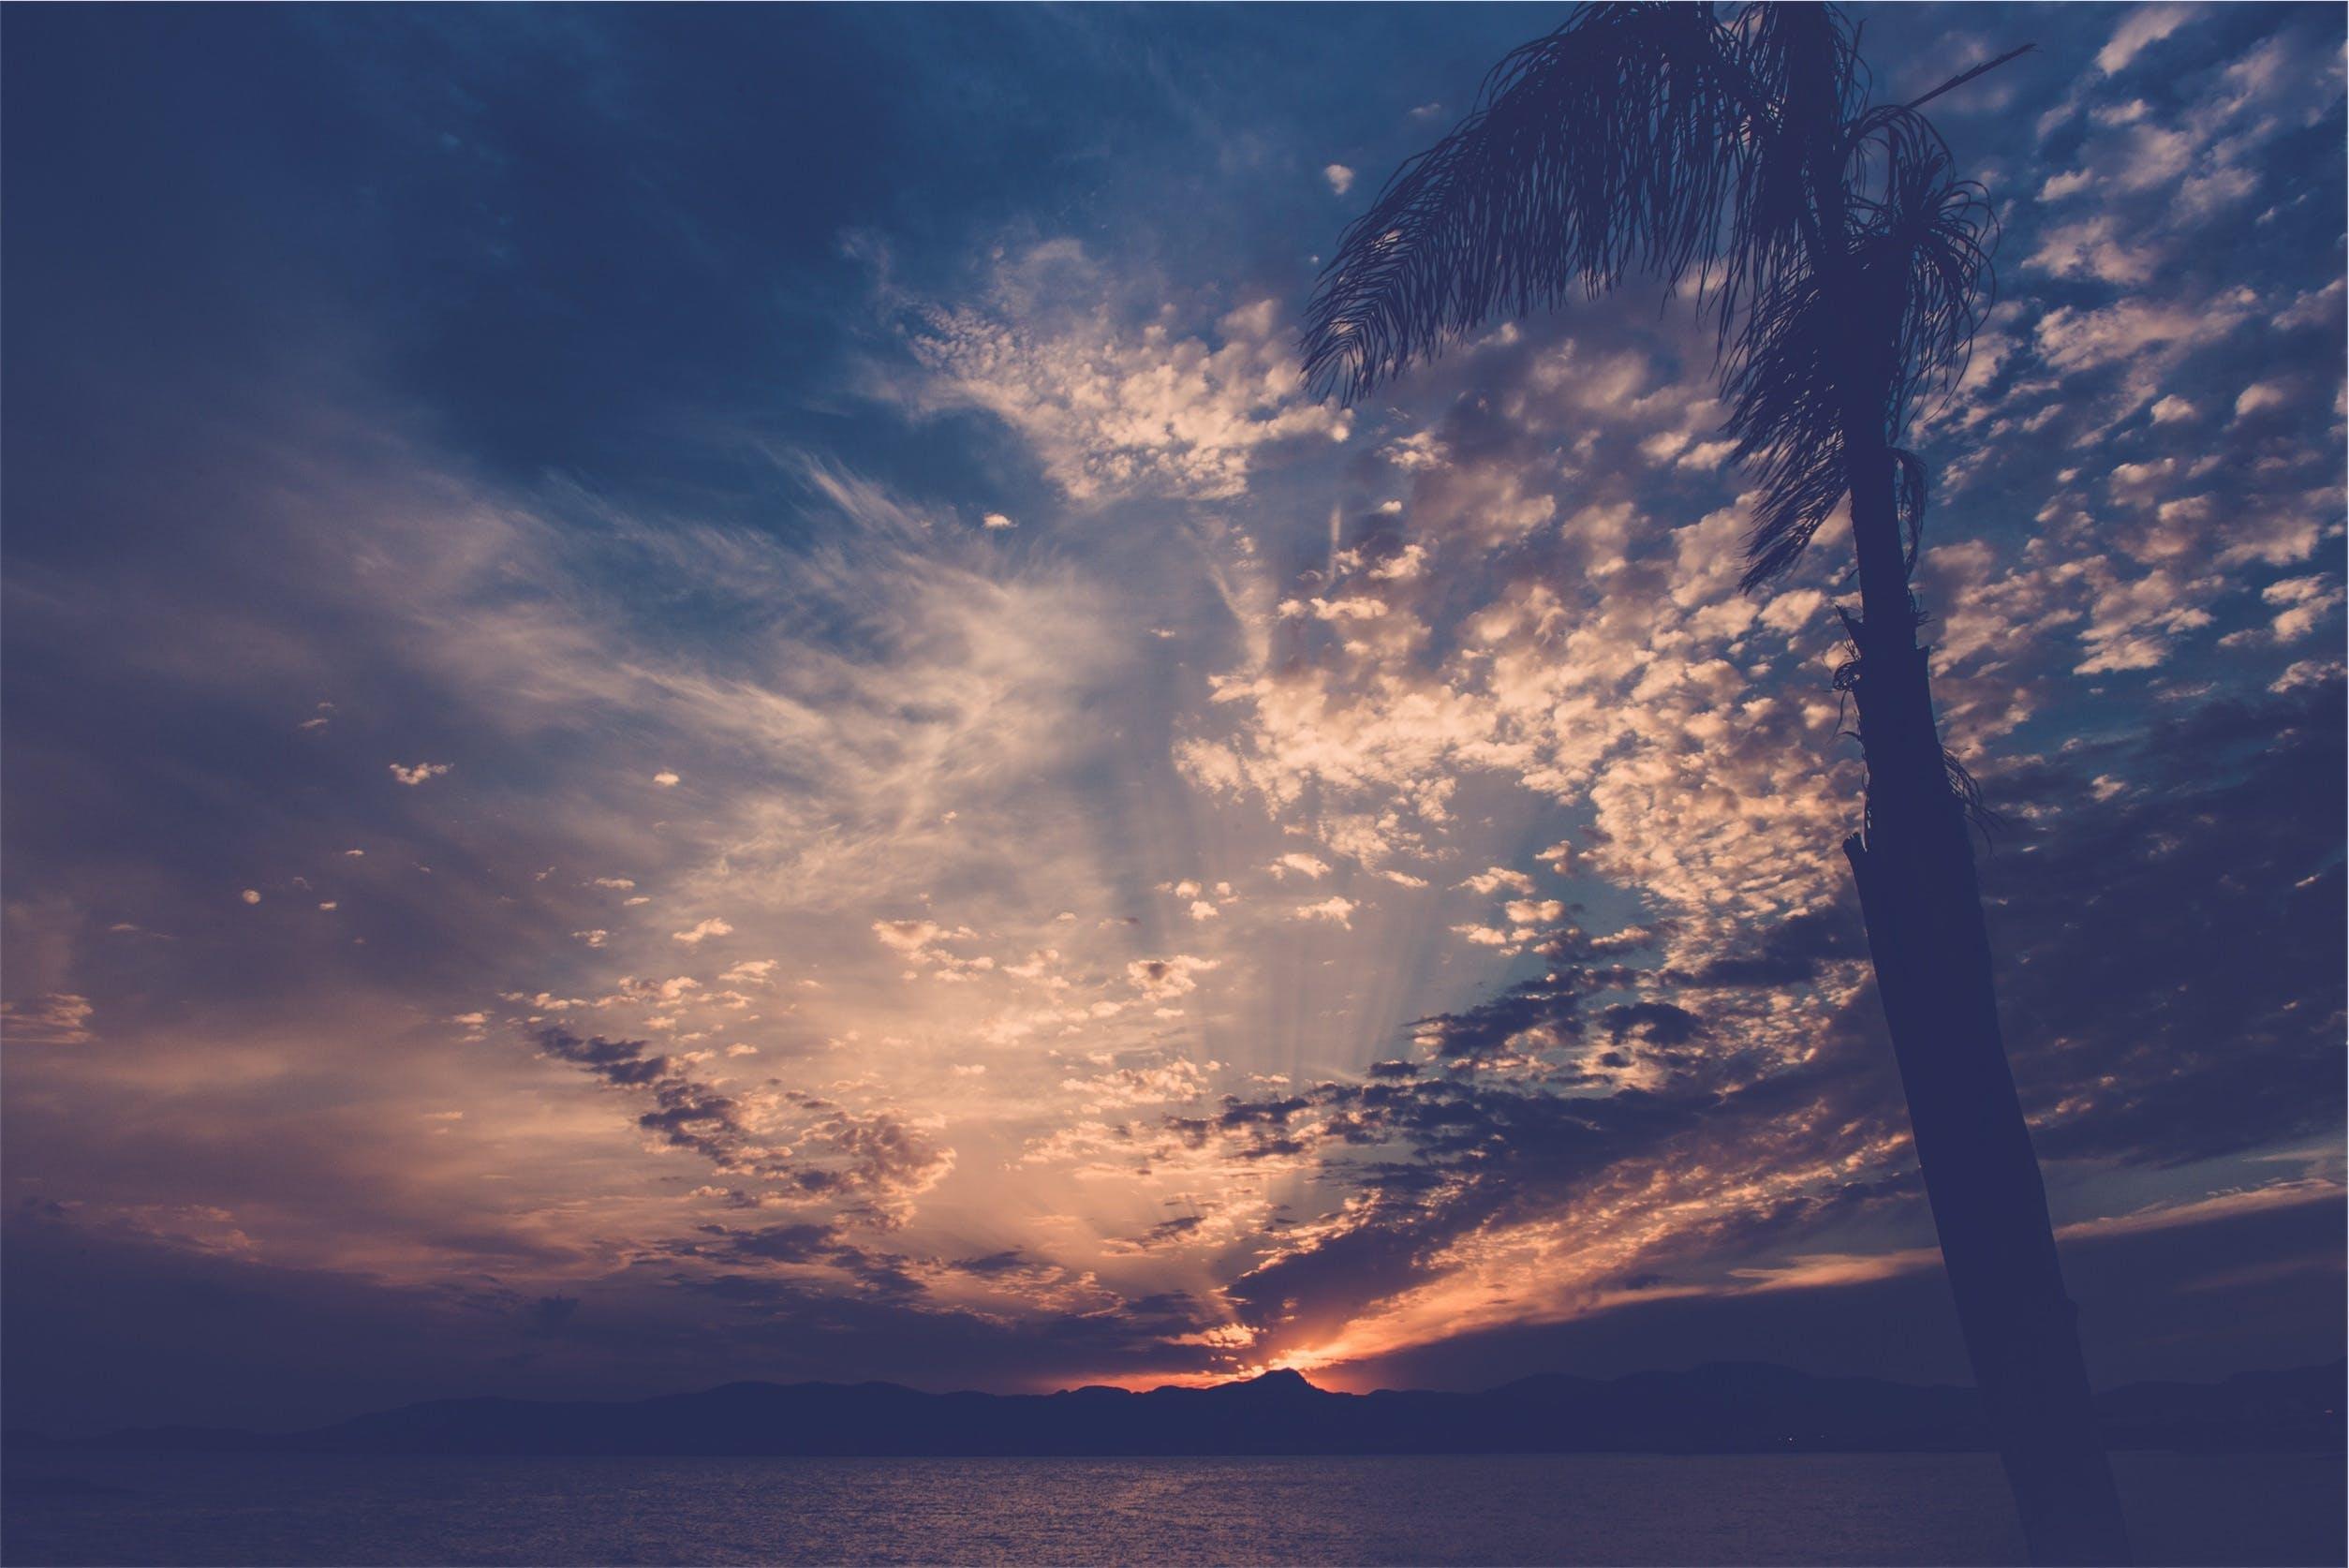 Free stock photo of sky, sunset, night, water